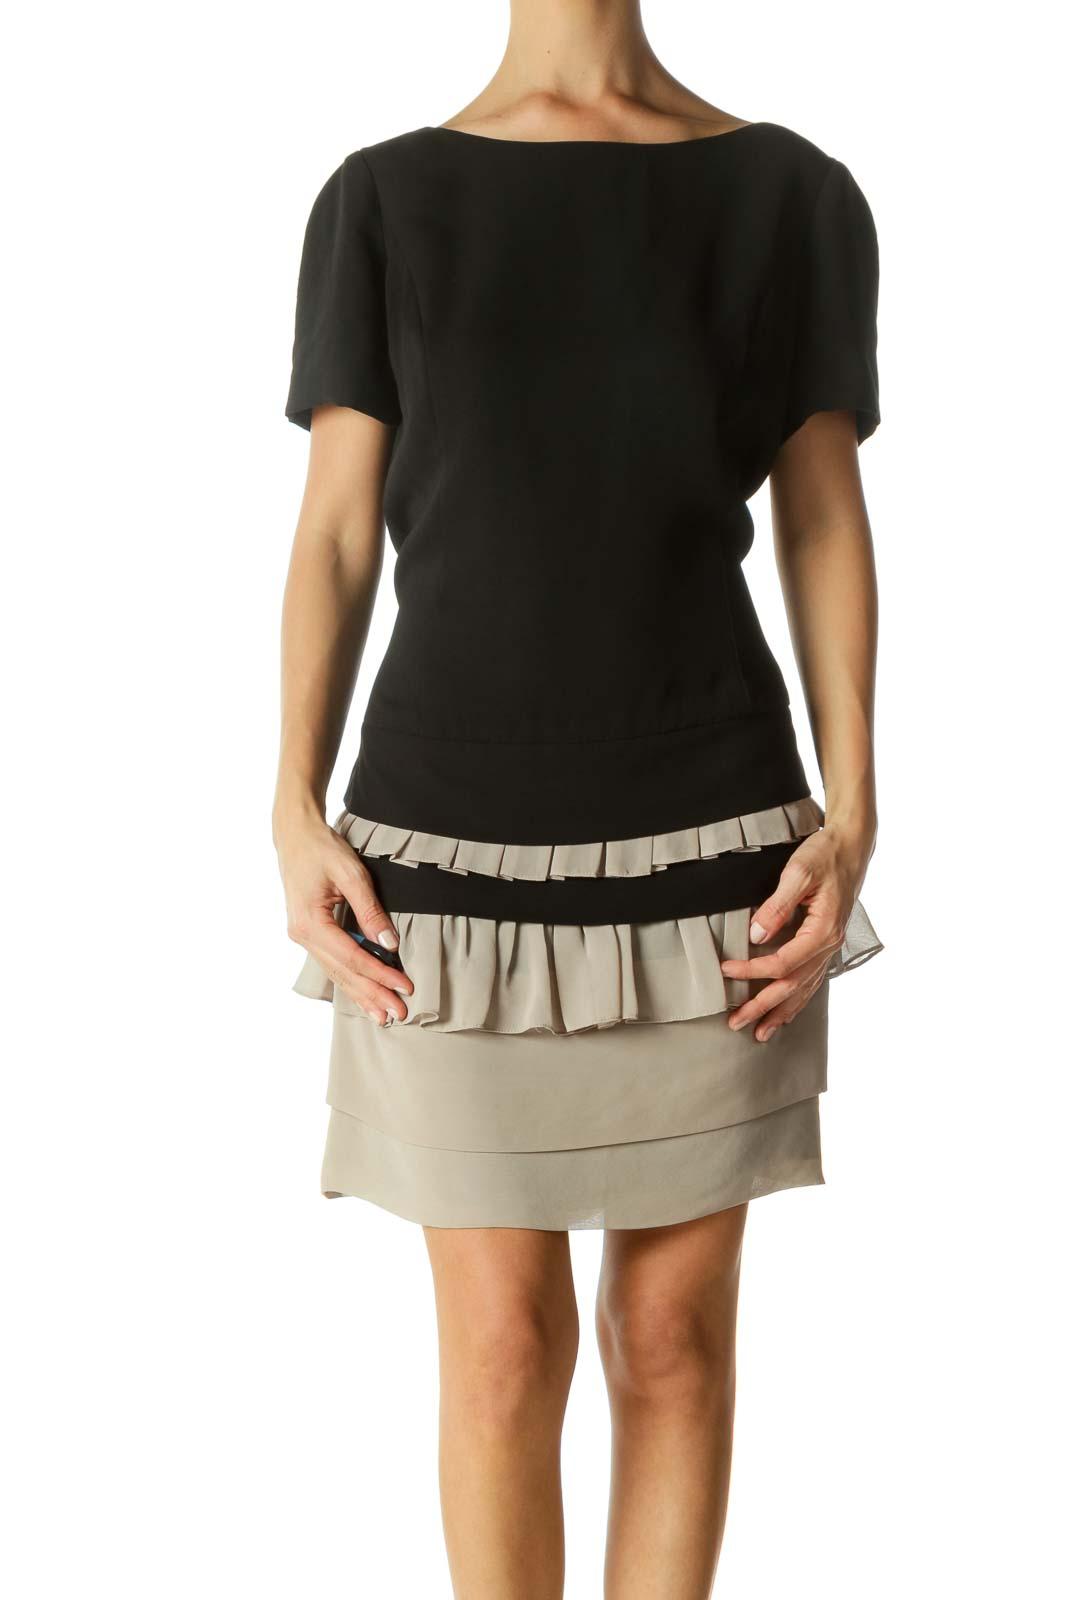 Black Beige Round Neck Short Sleeve Flared Cocktail Dress